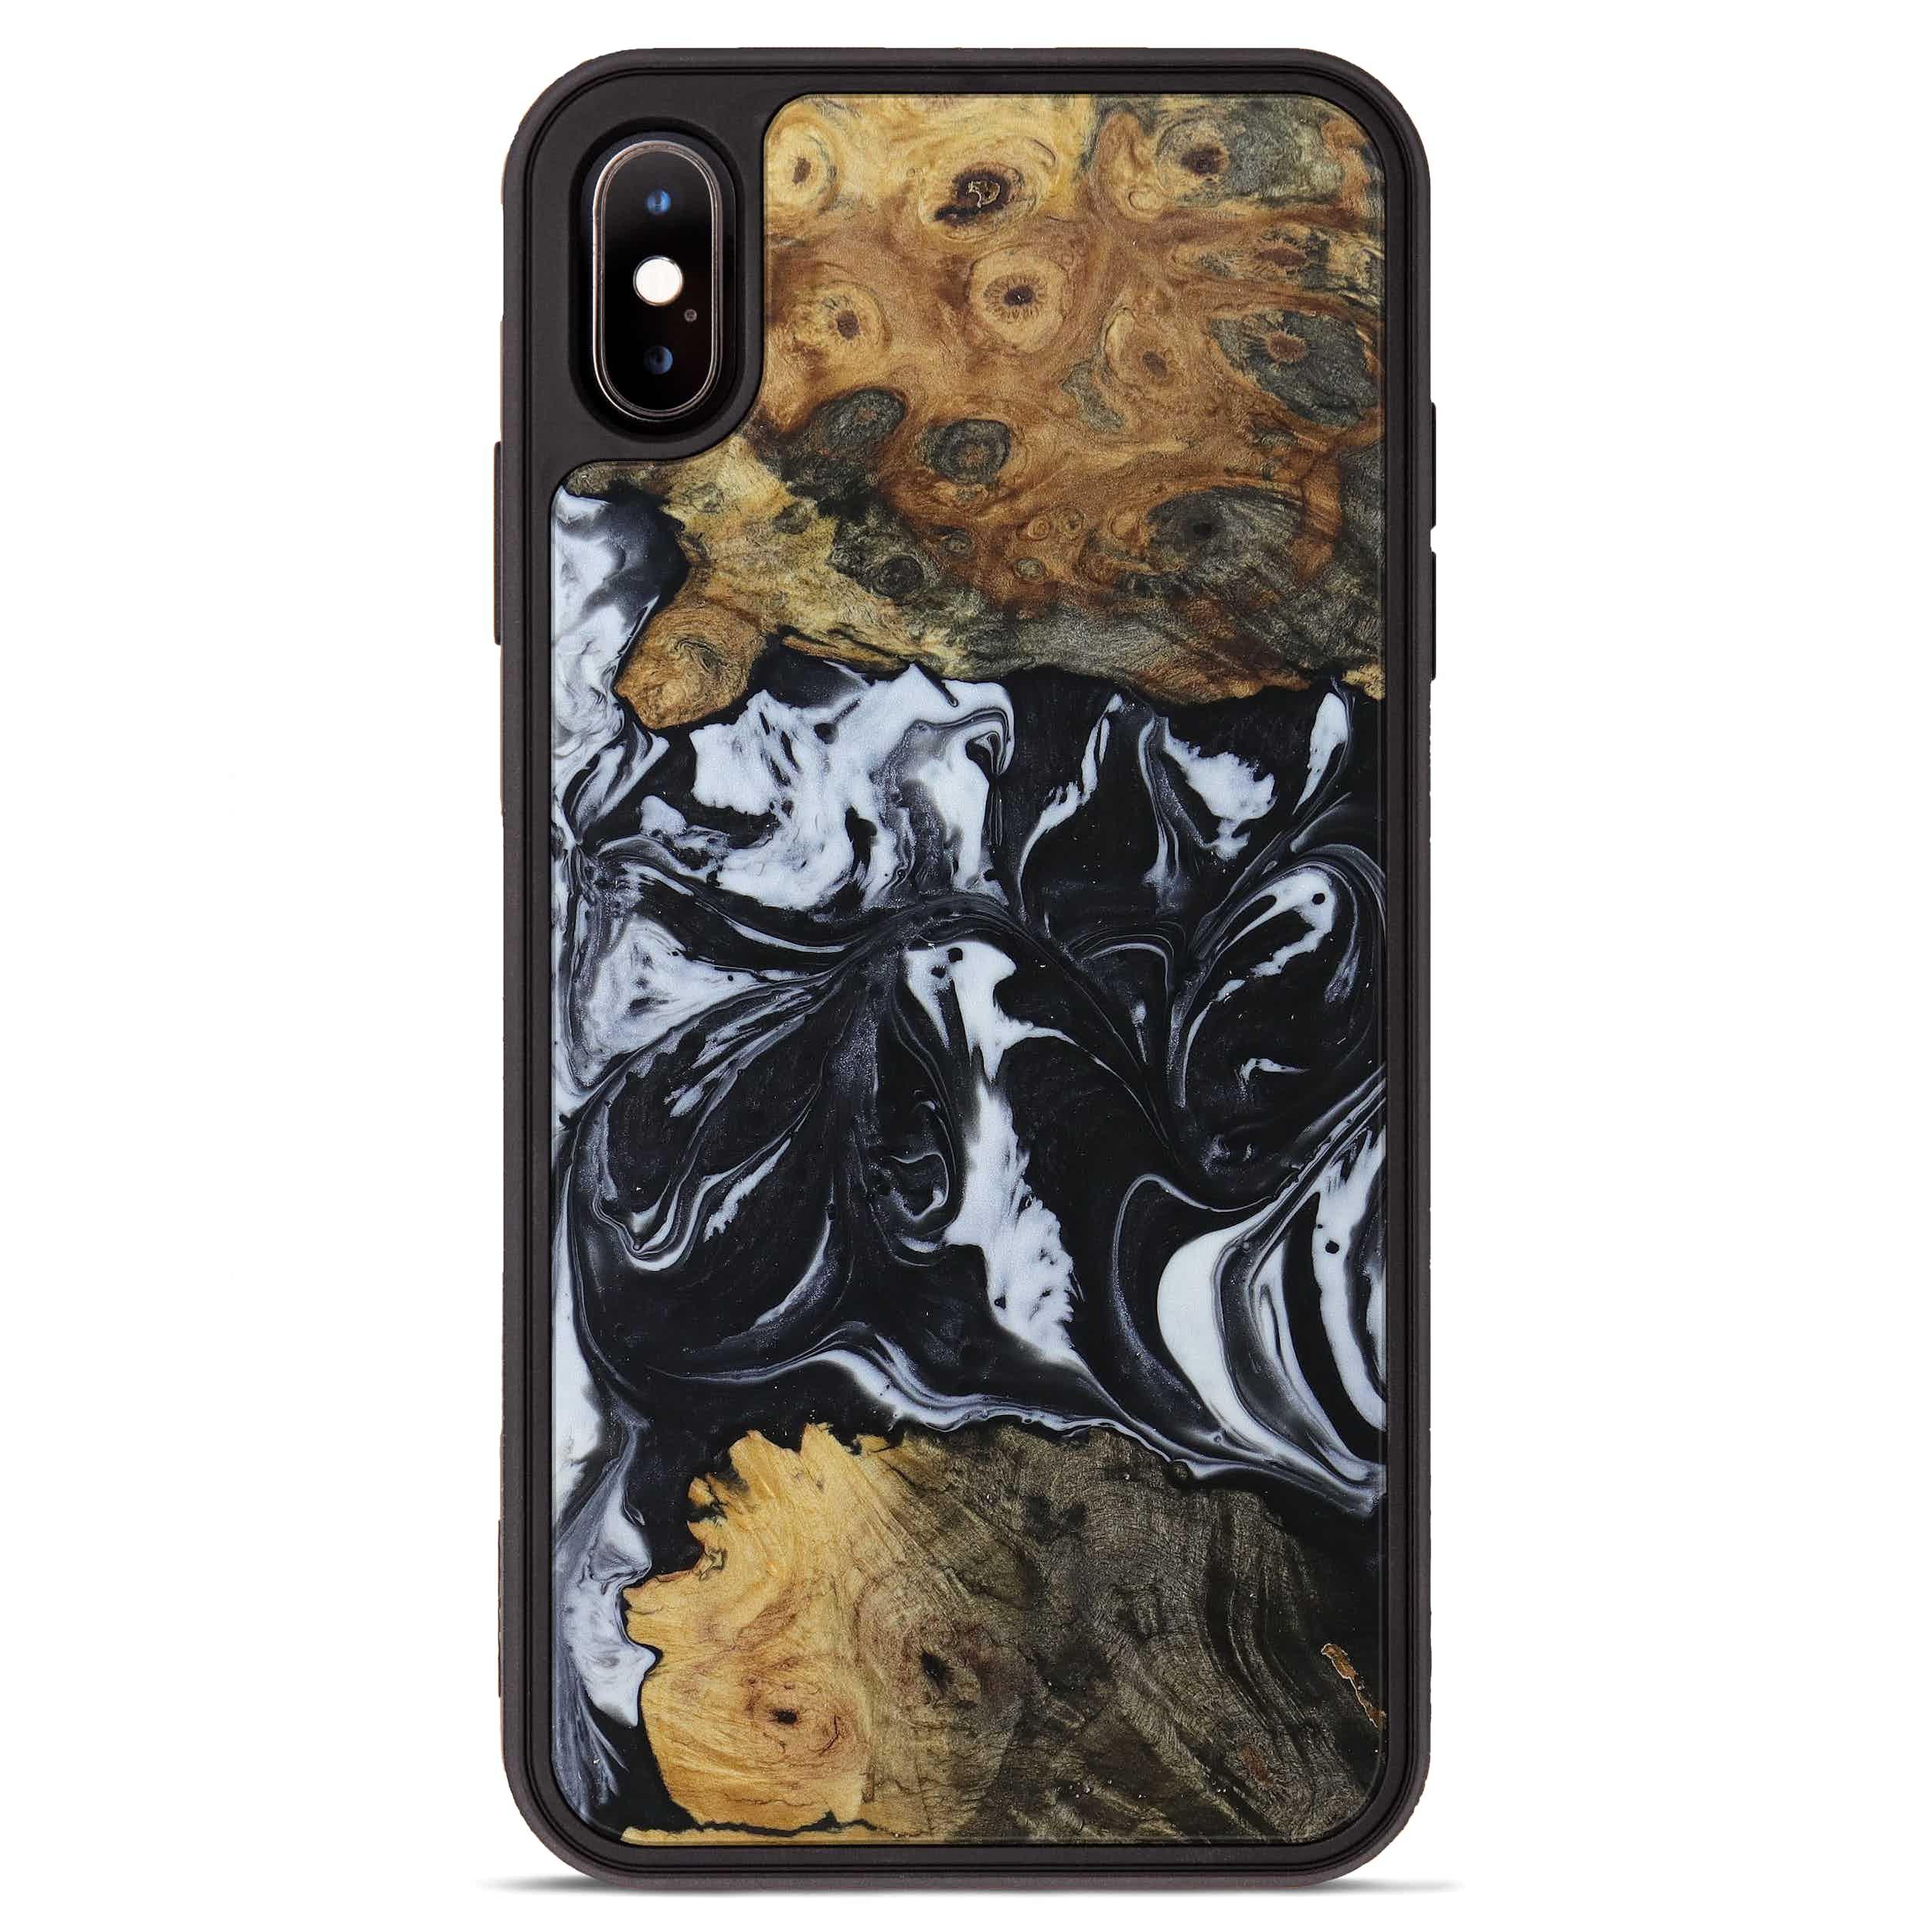 iPhone Xs Max Wood+Resin Phone Case - Pars (Black & White, 397366)